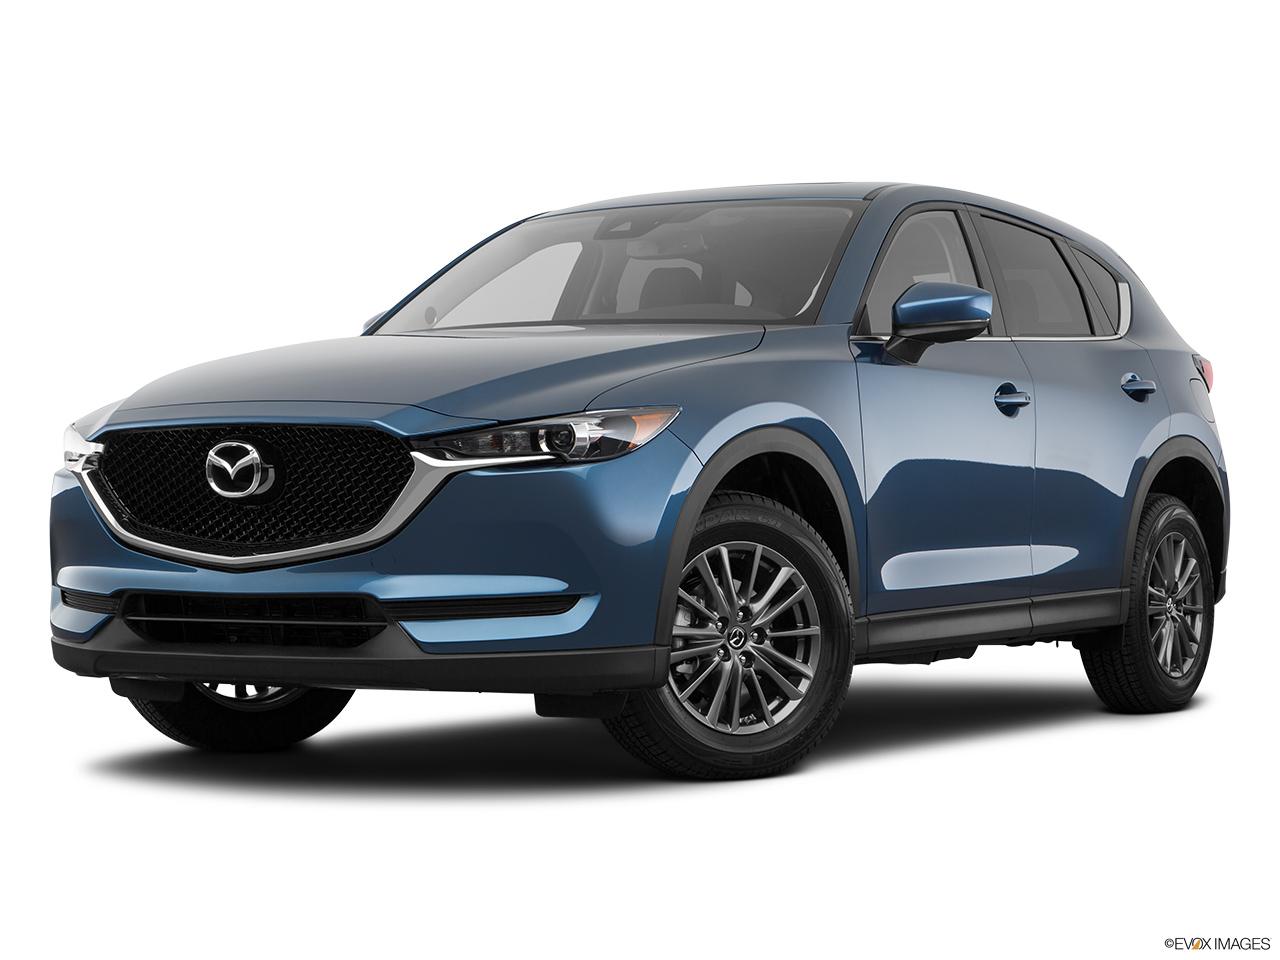 car pictures list for mazda cx 5 2018 2 5l prestige awd qatar yallamotor. Black Bedroom Furniture Sets. Home Design Ideas